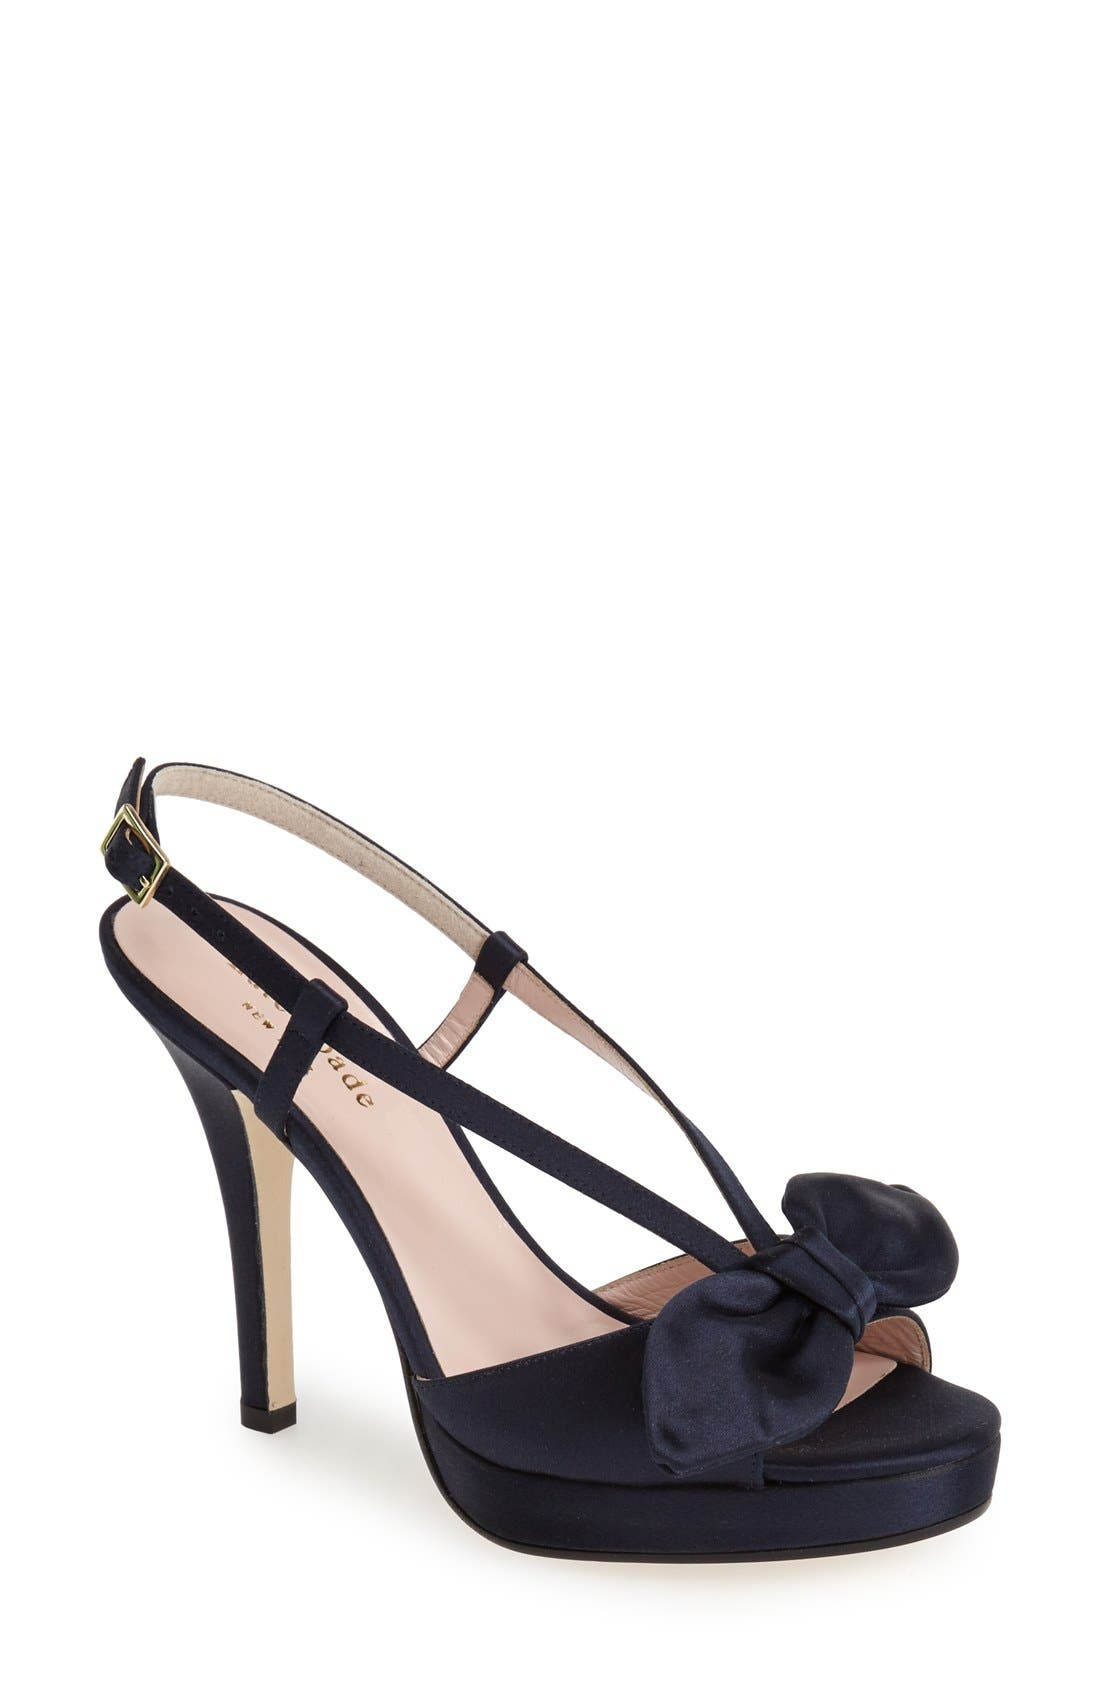 Main Image - kate spade new york 'rezza' platform sandal (Women)